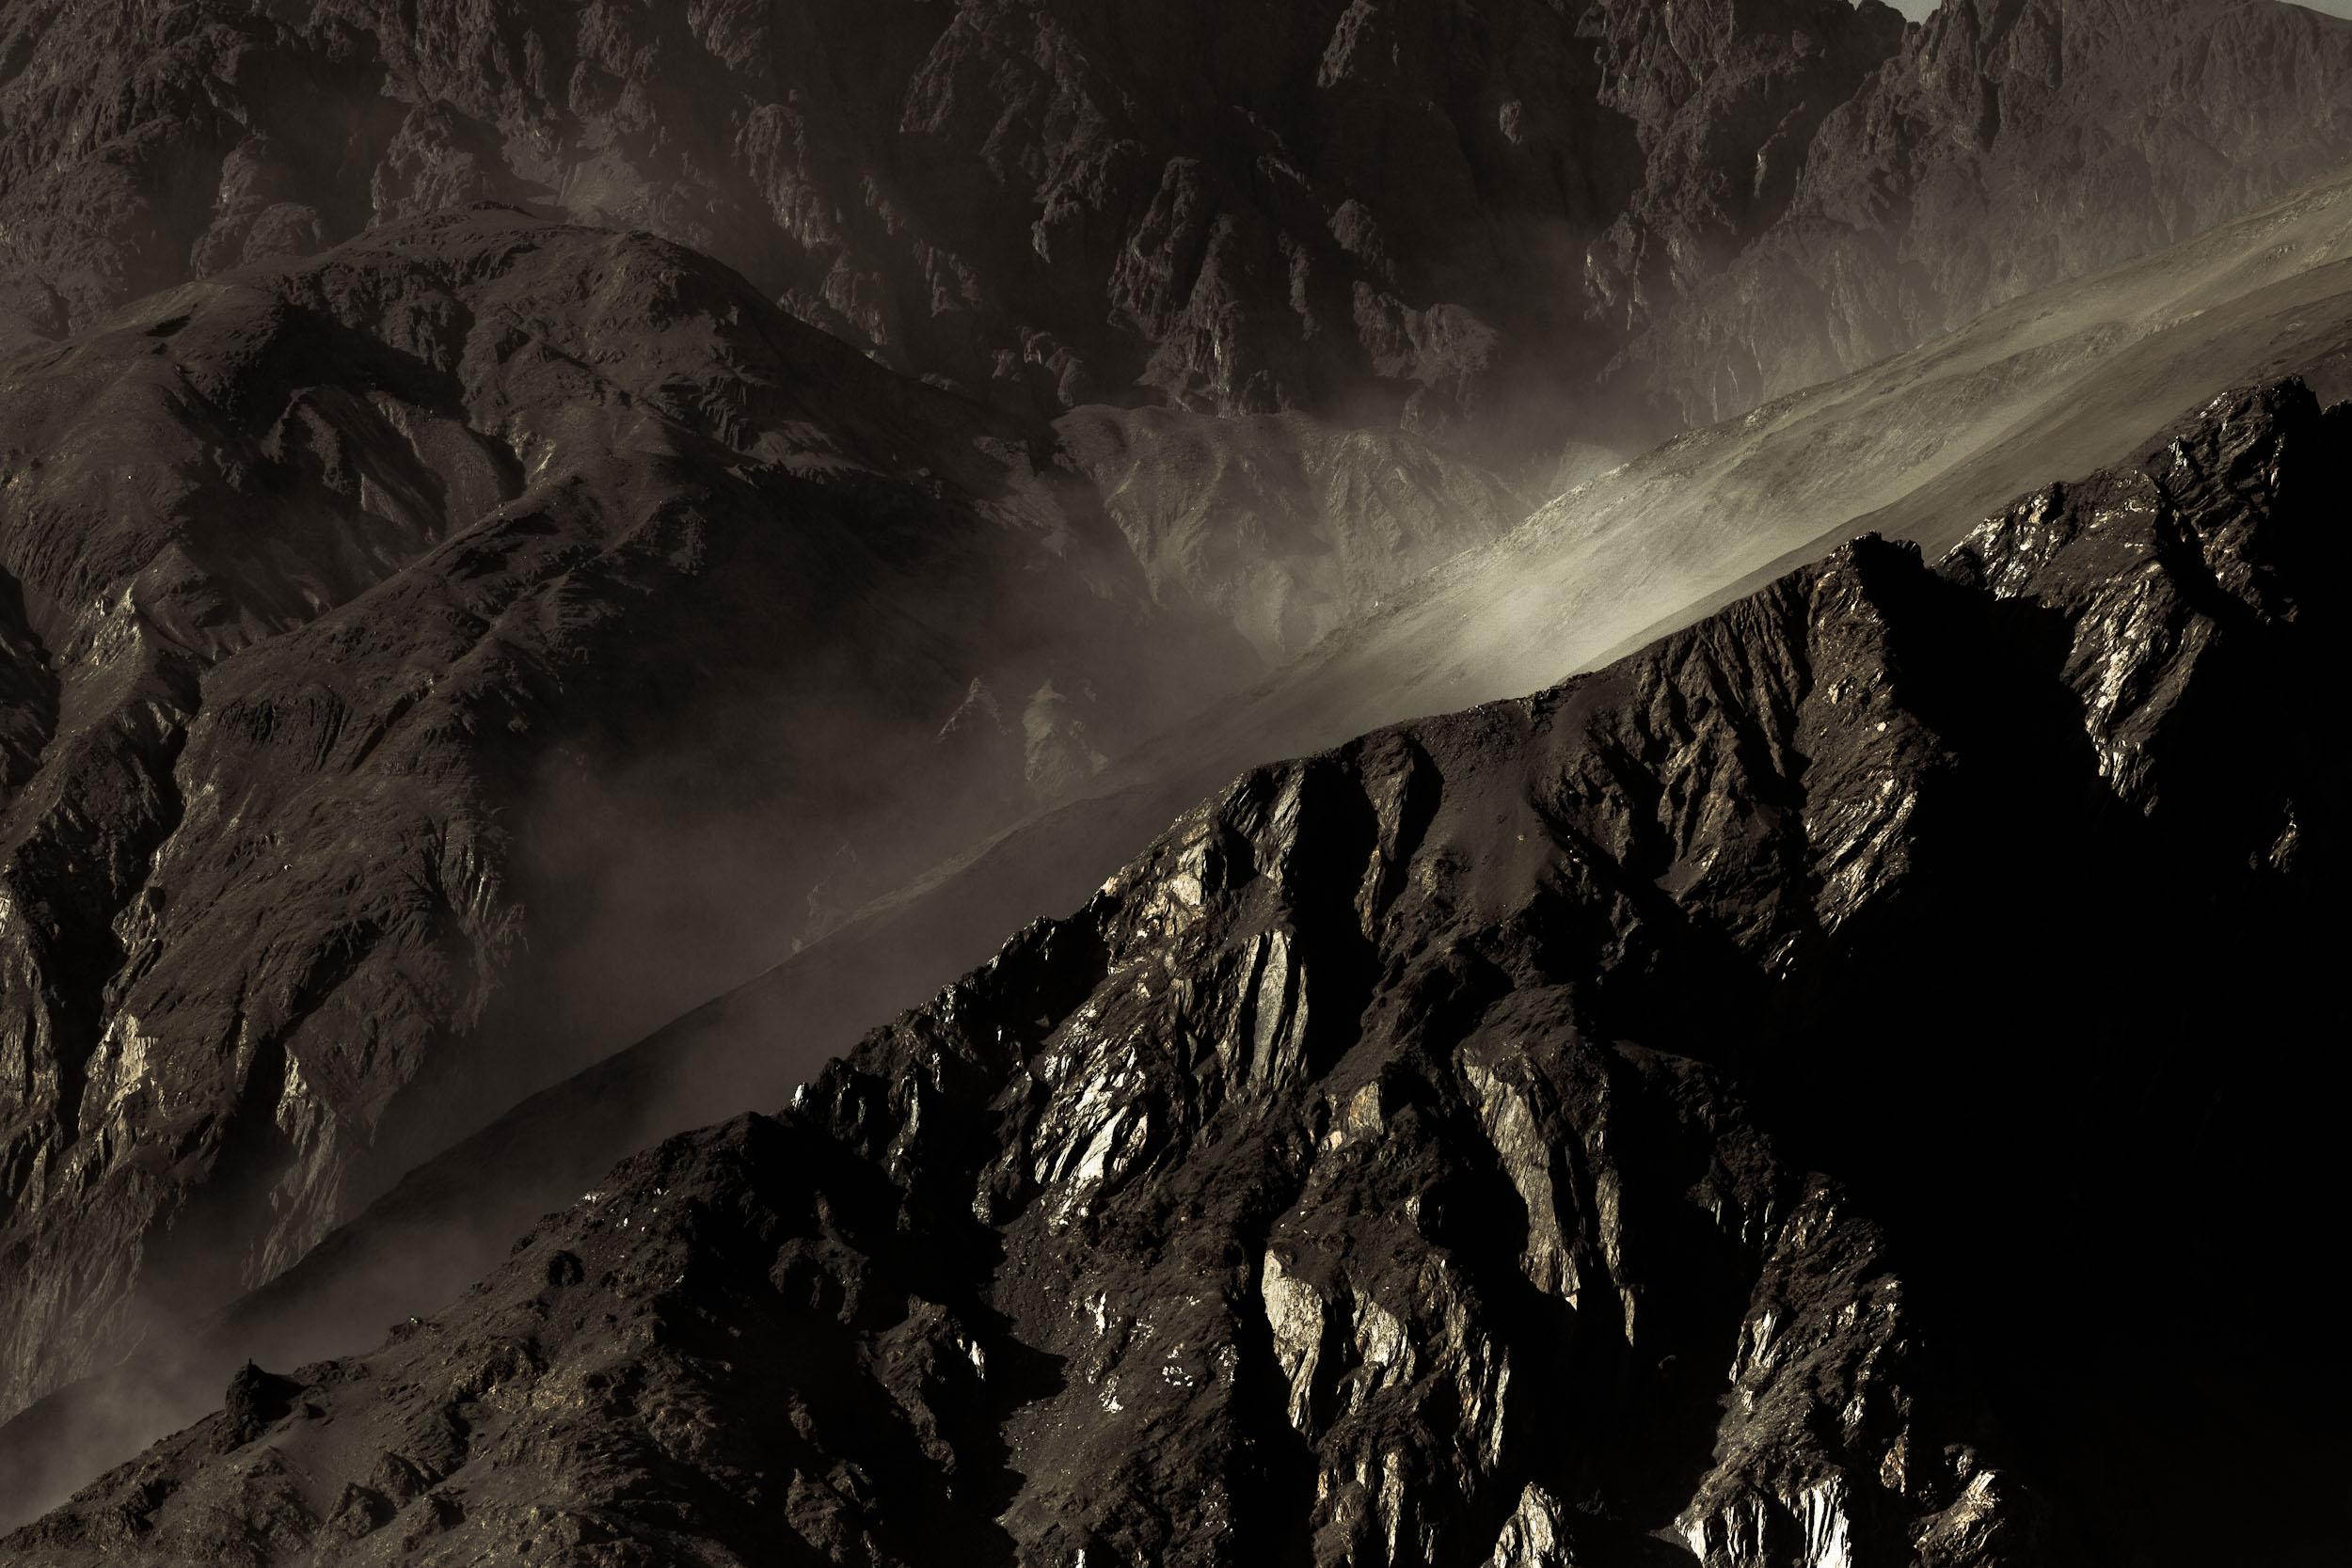 Sindhur_Photography_Travel_Landscape_Ladakh-25.JPG